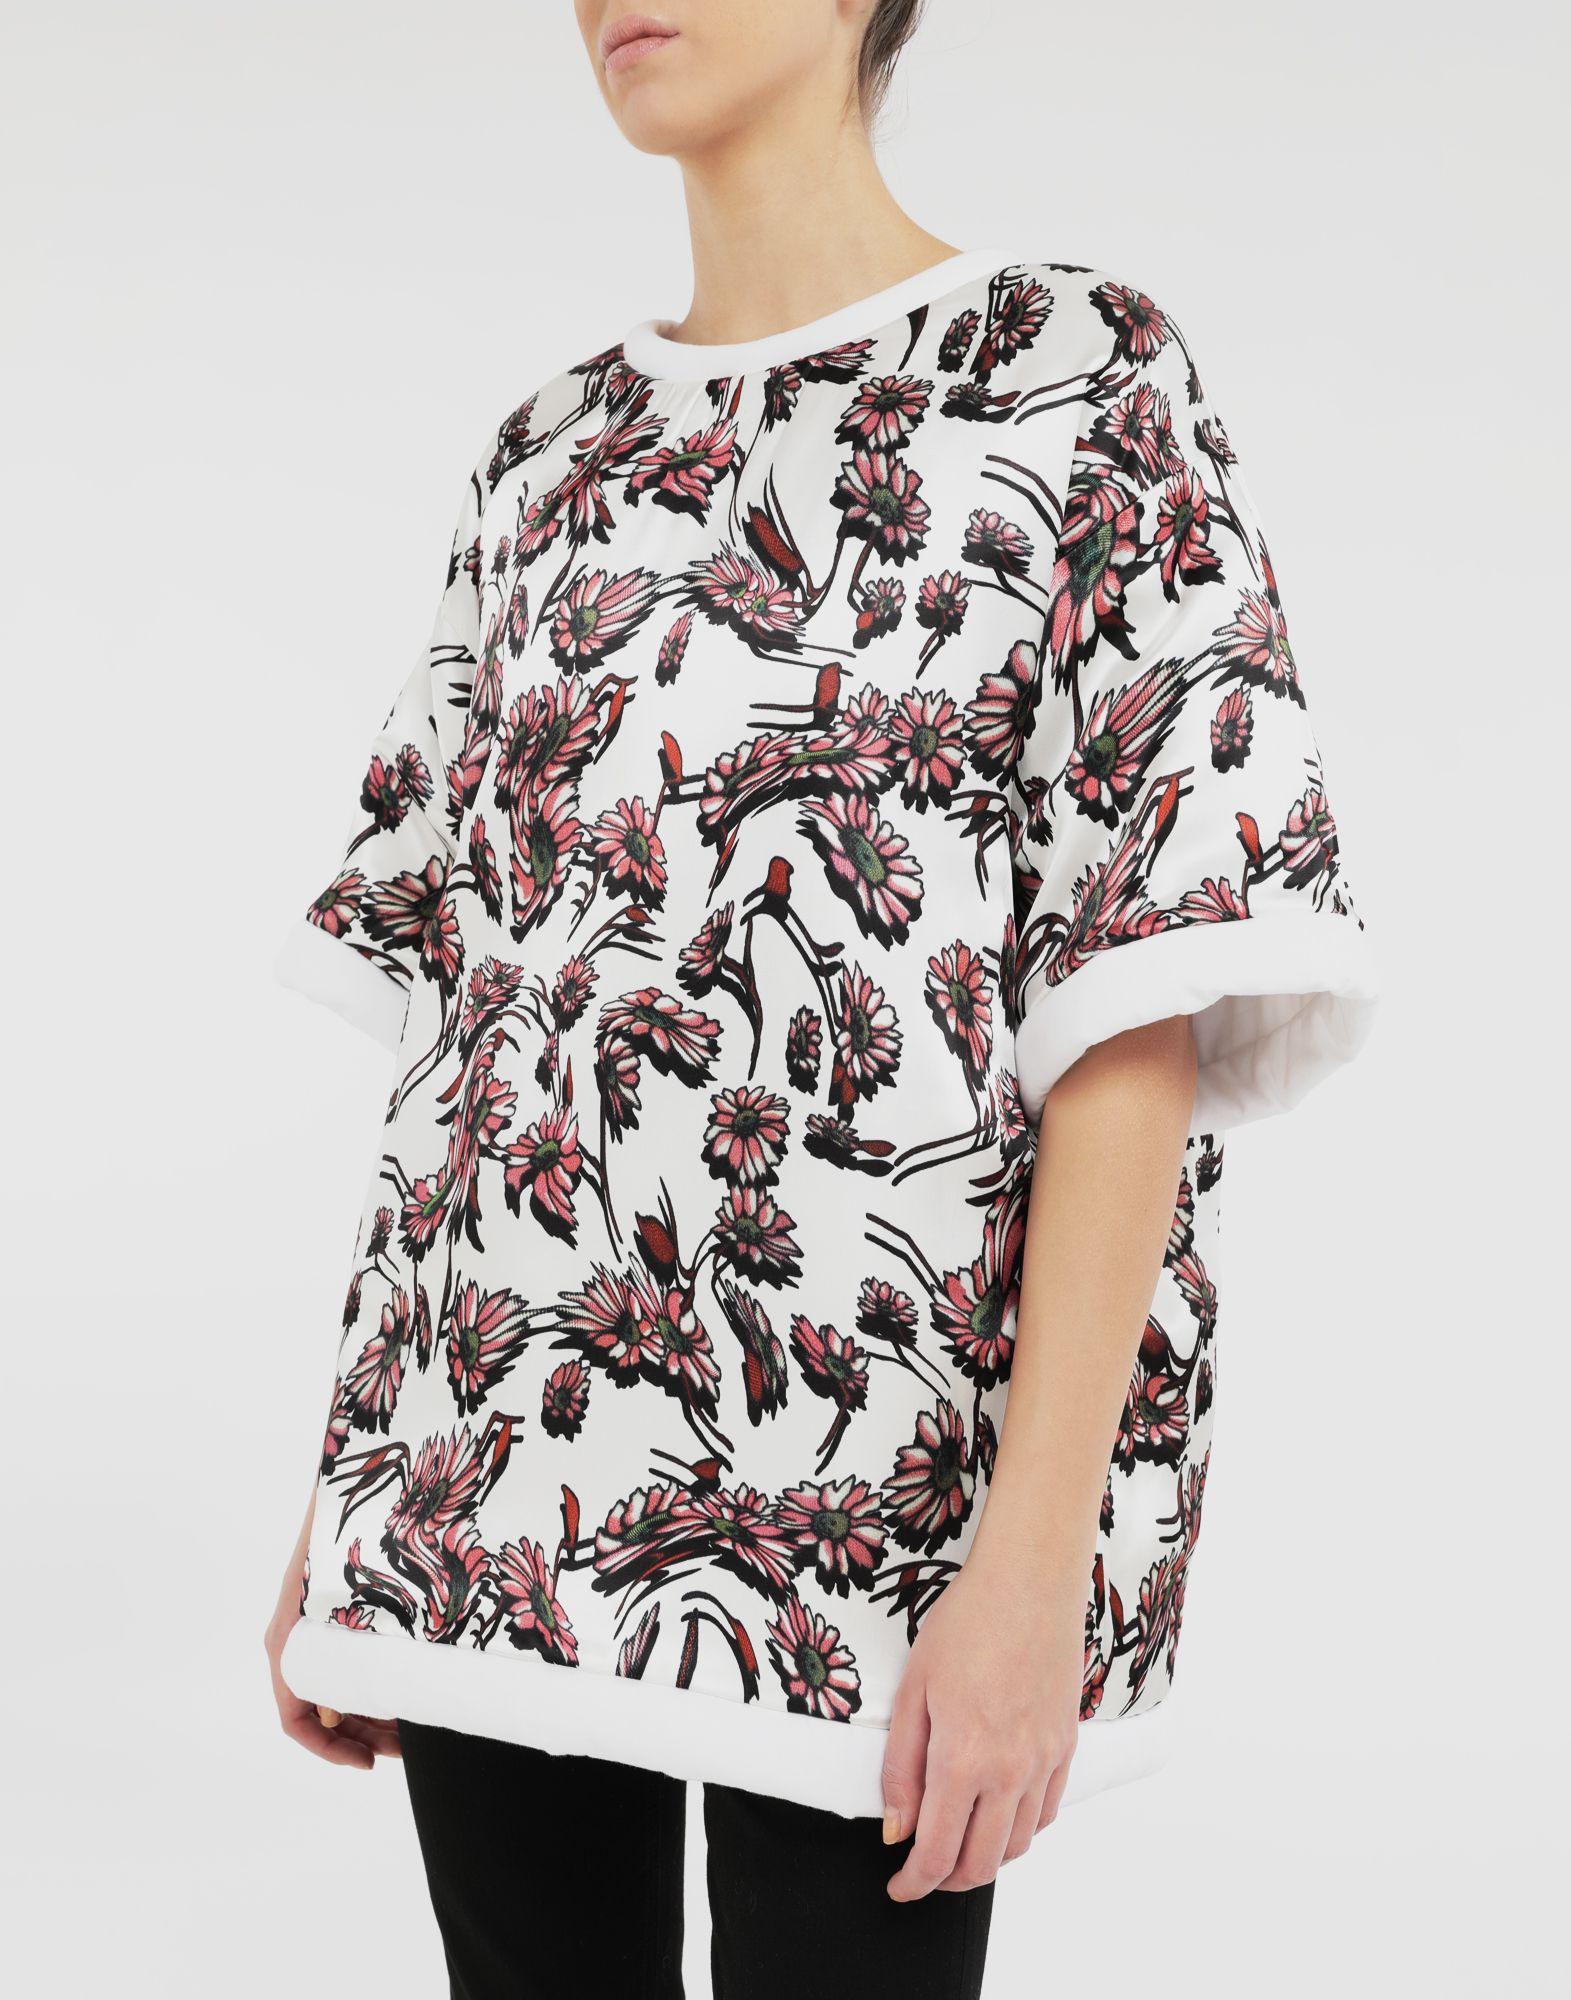 MM6 MAISON MARGIELA Camiseta con logotipo invertido Camiseta de manga corta Mujer r